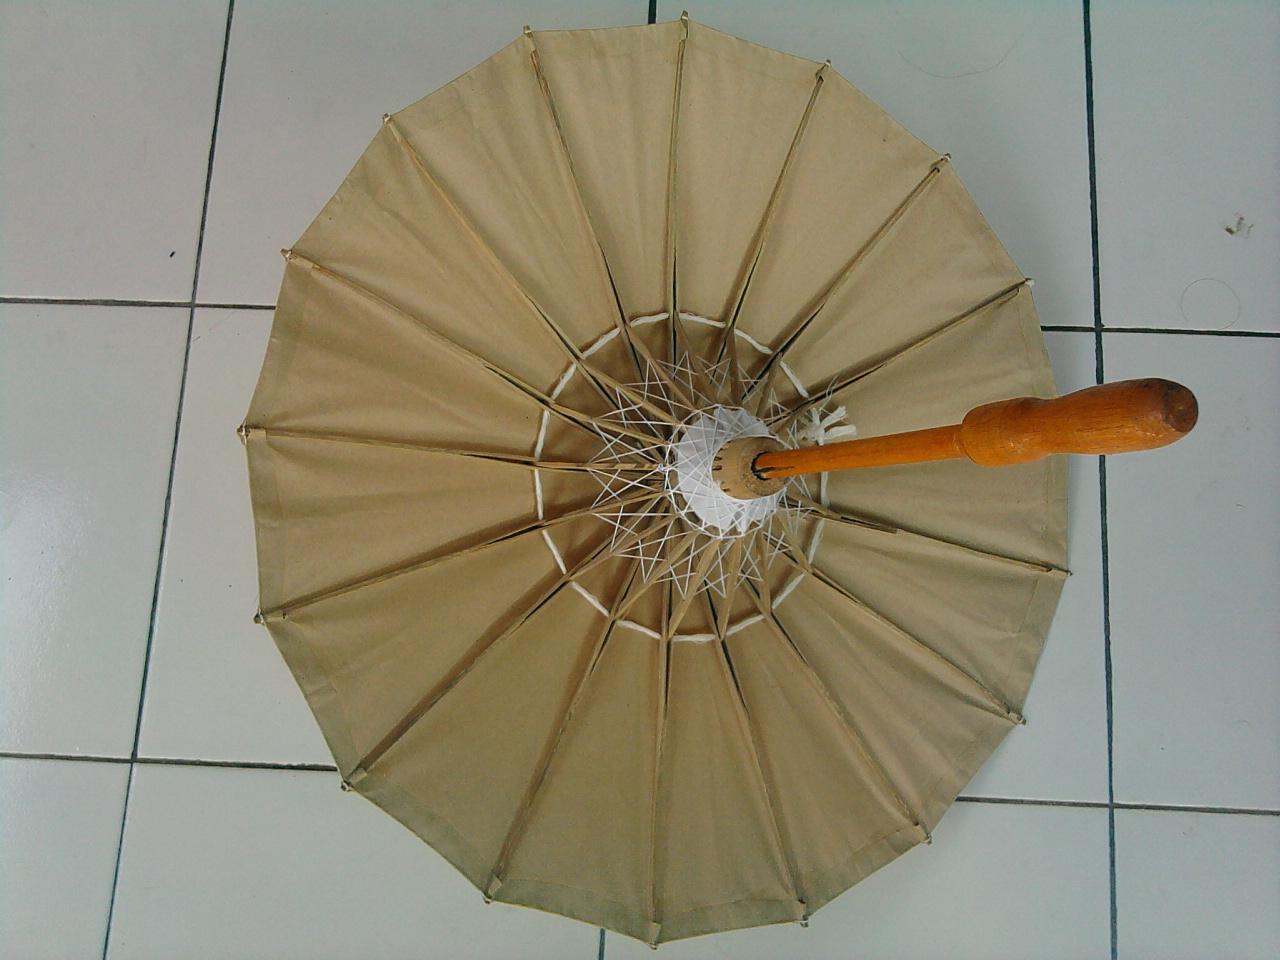 Payung Dengan Pegangan Bambu